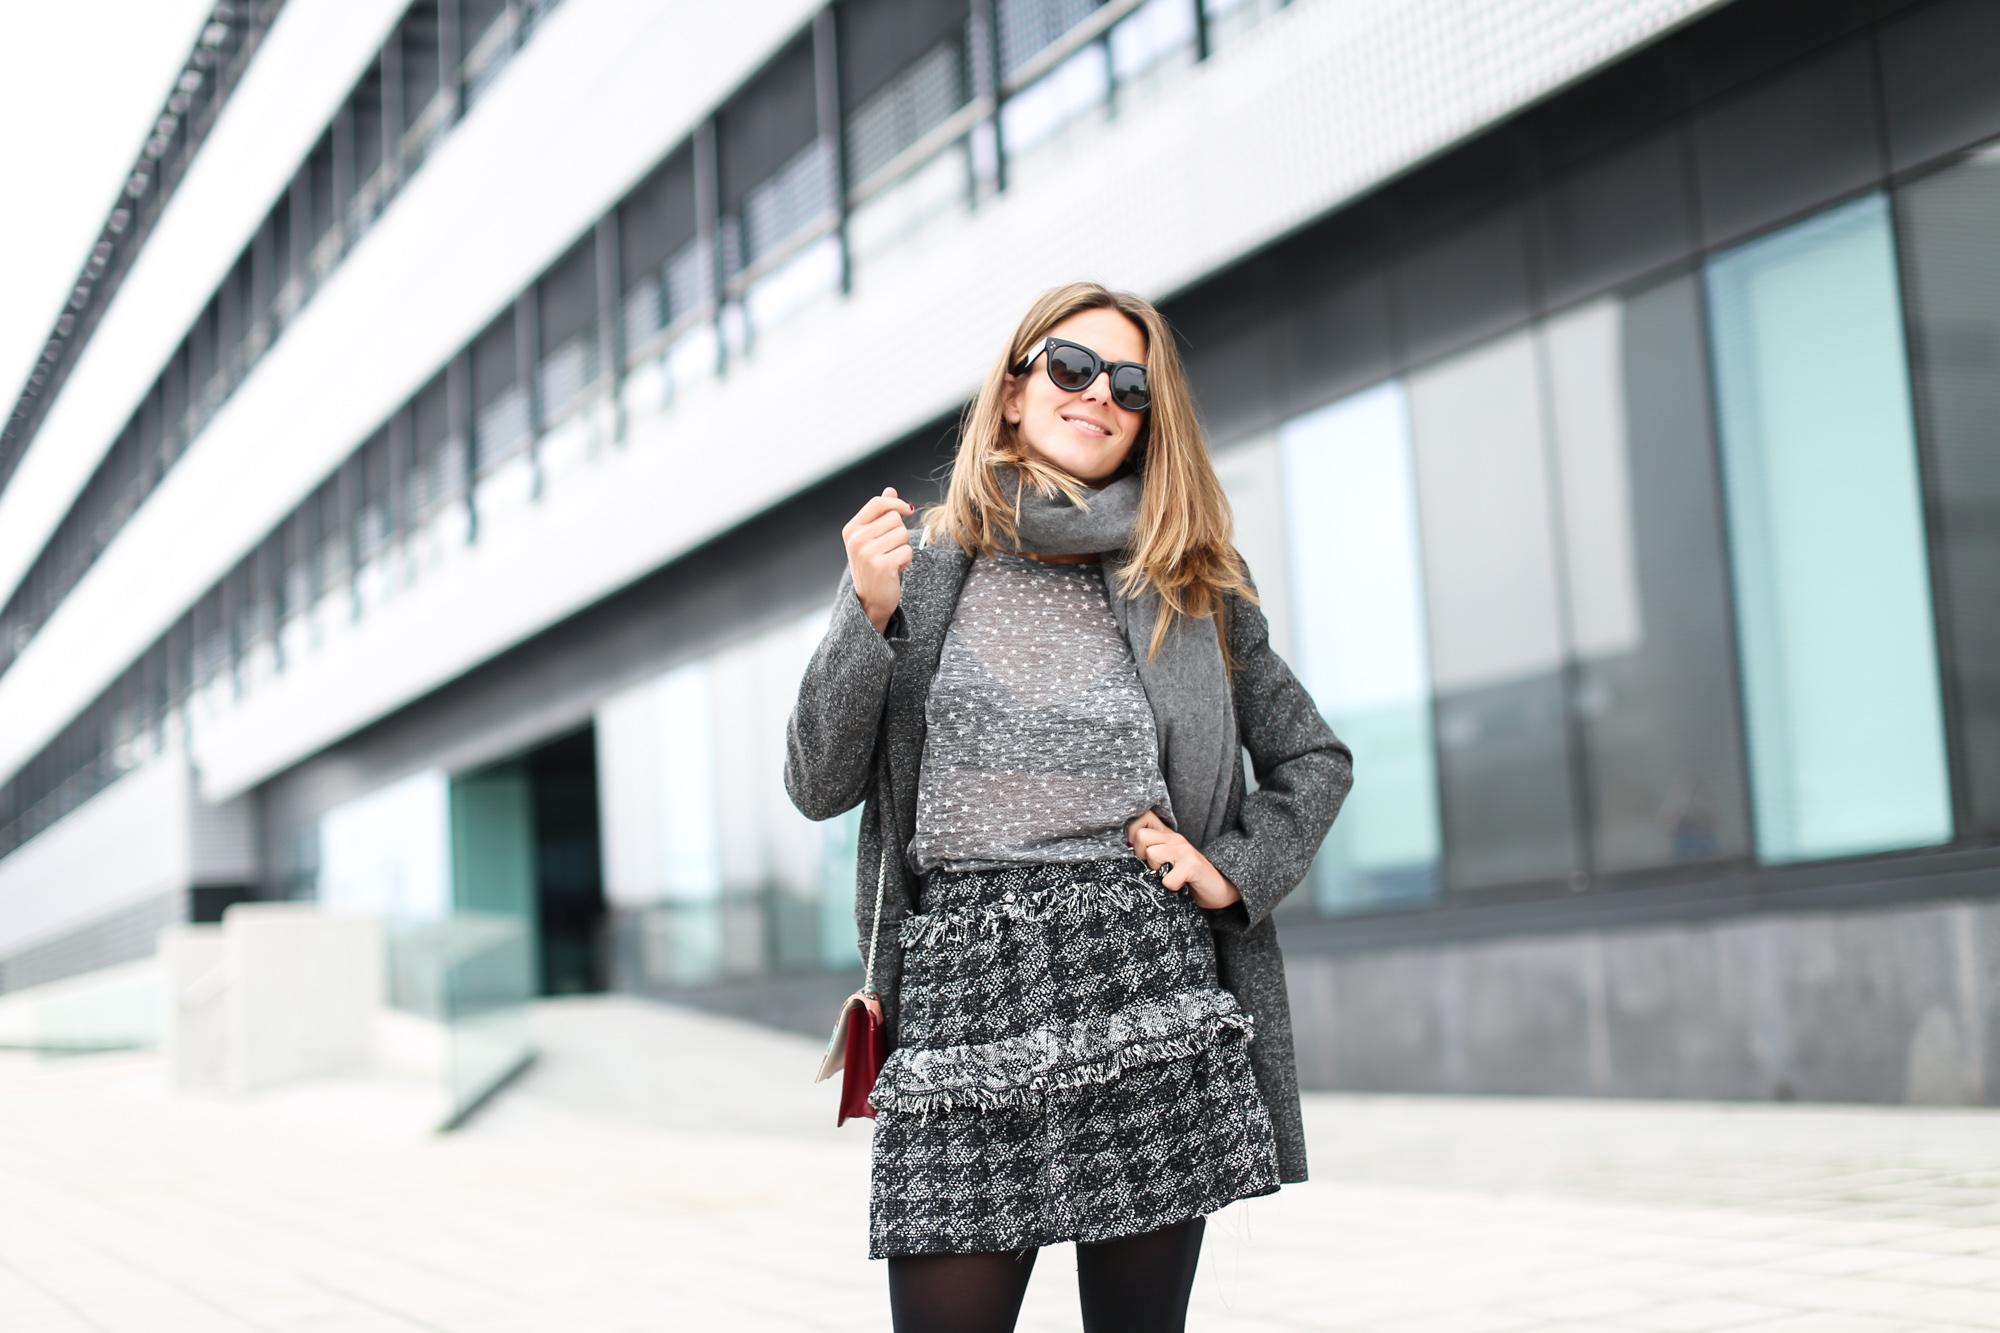 Clochet_streestyle_fashionblogger_minifaldatweedgriszara_botinesdickerisabelmarant_bolsospigatitamadrid_gafasdesolceline-3